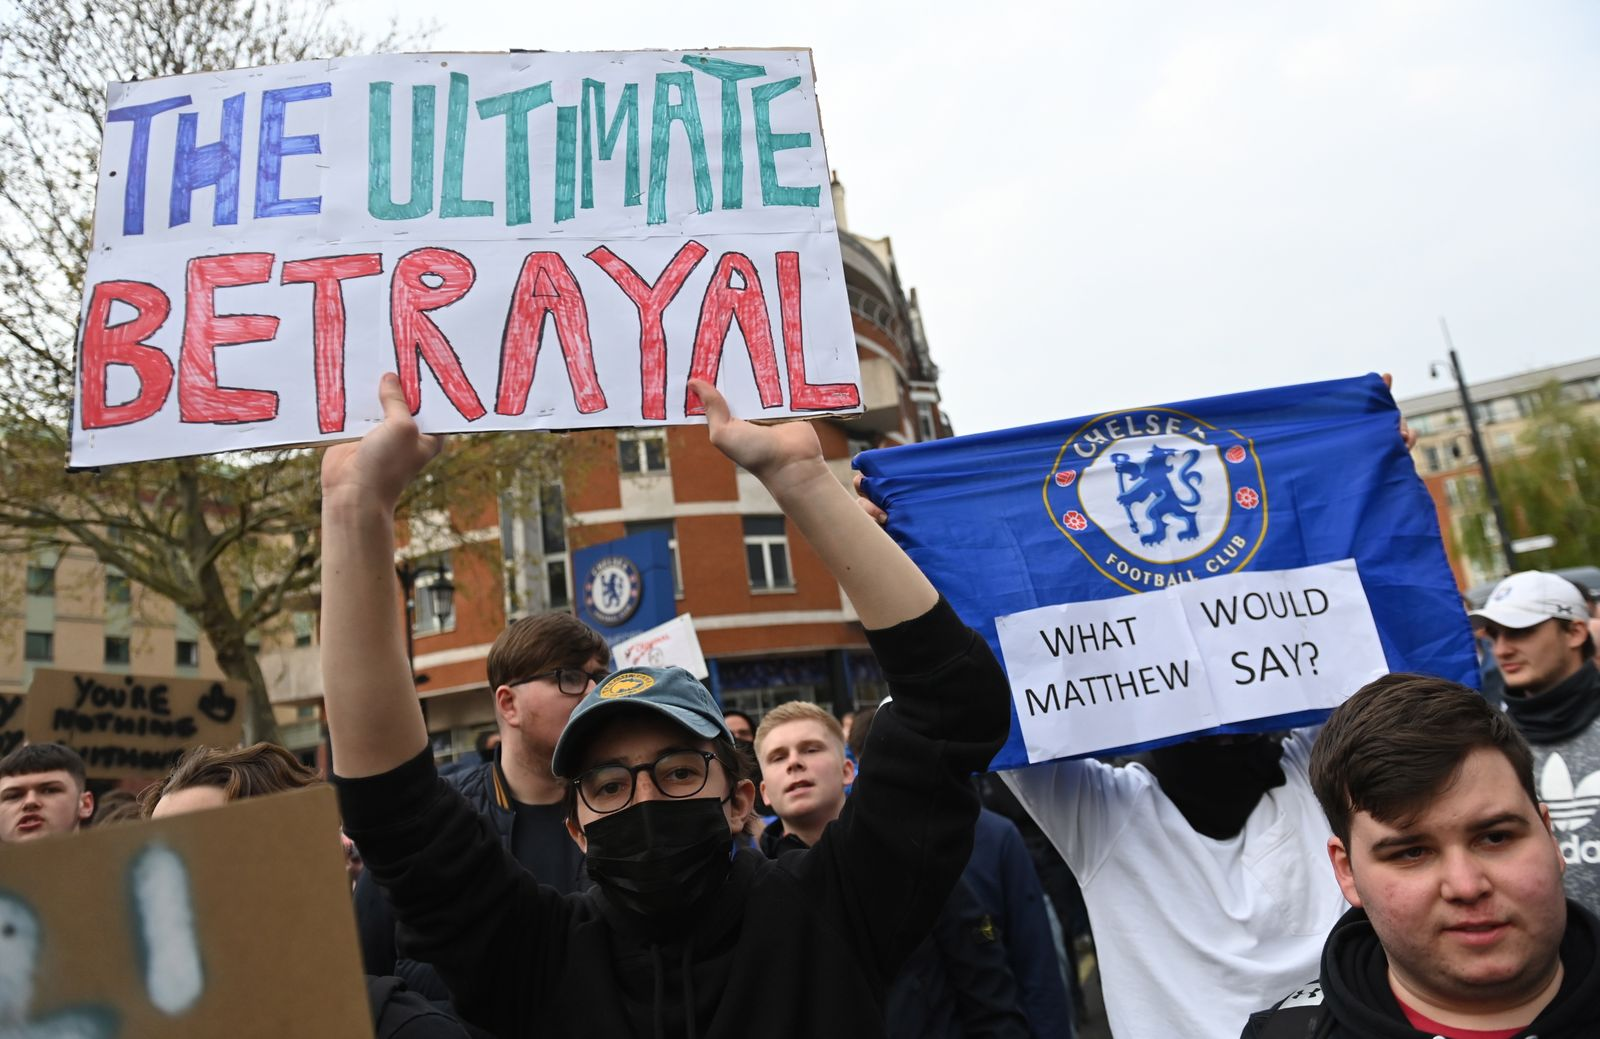 Protest against planned Super League